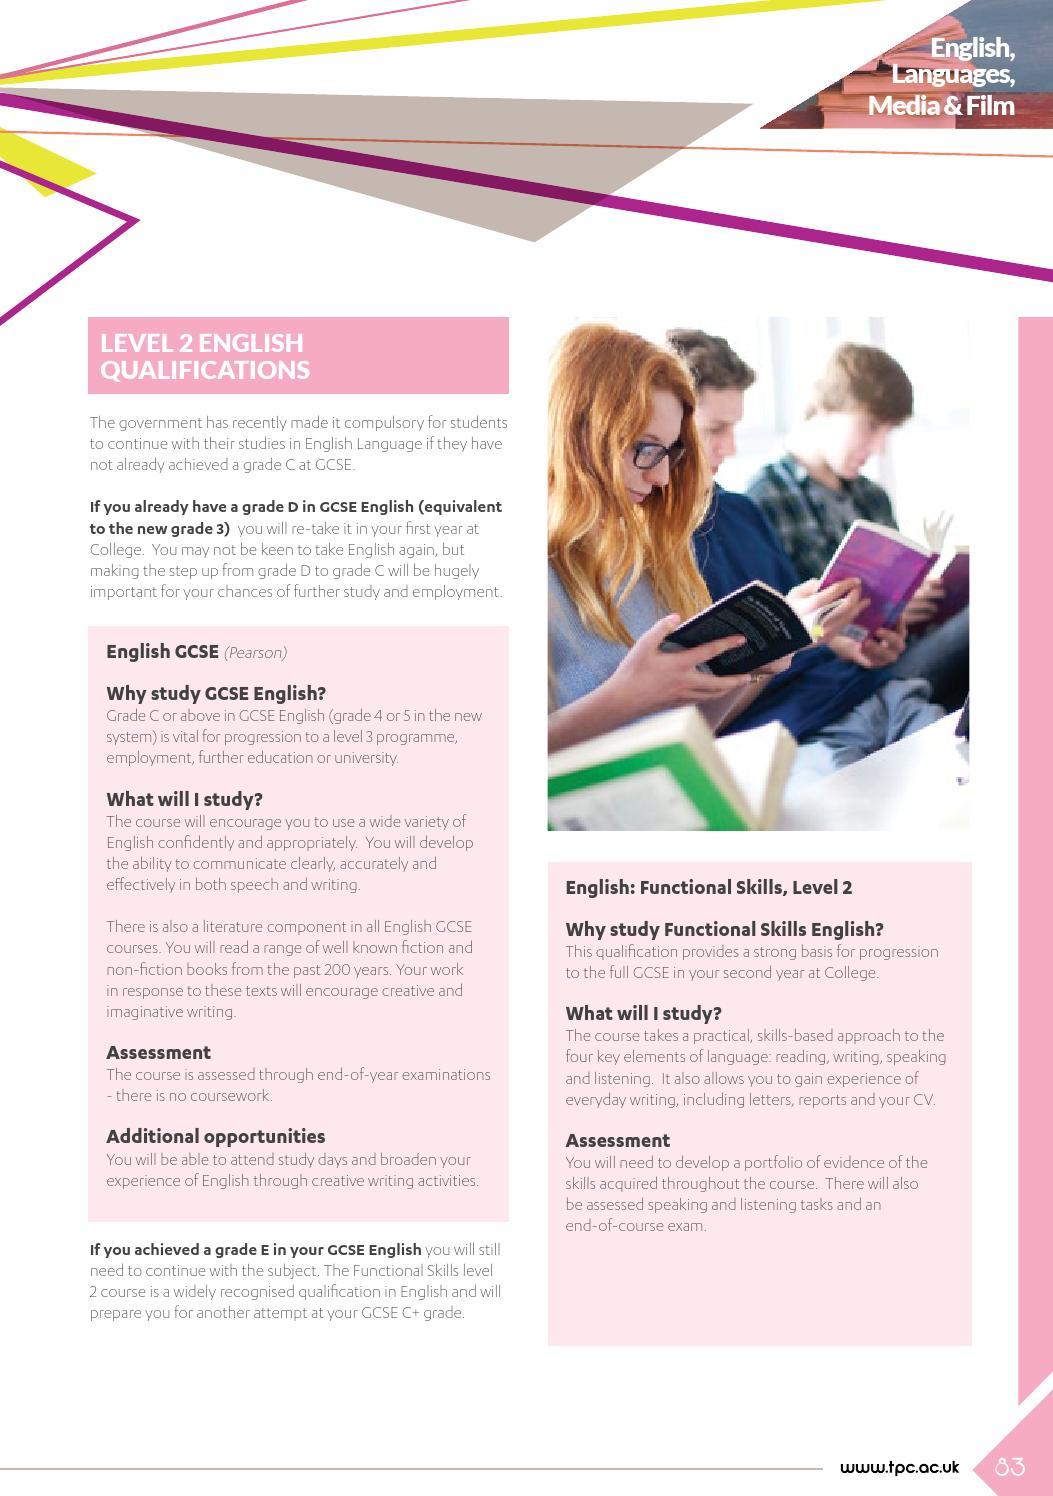 Term paper help online support service